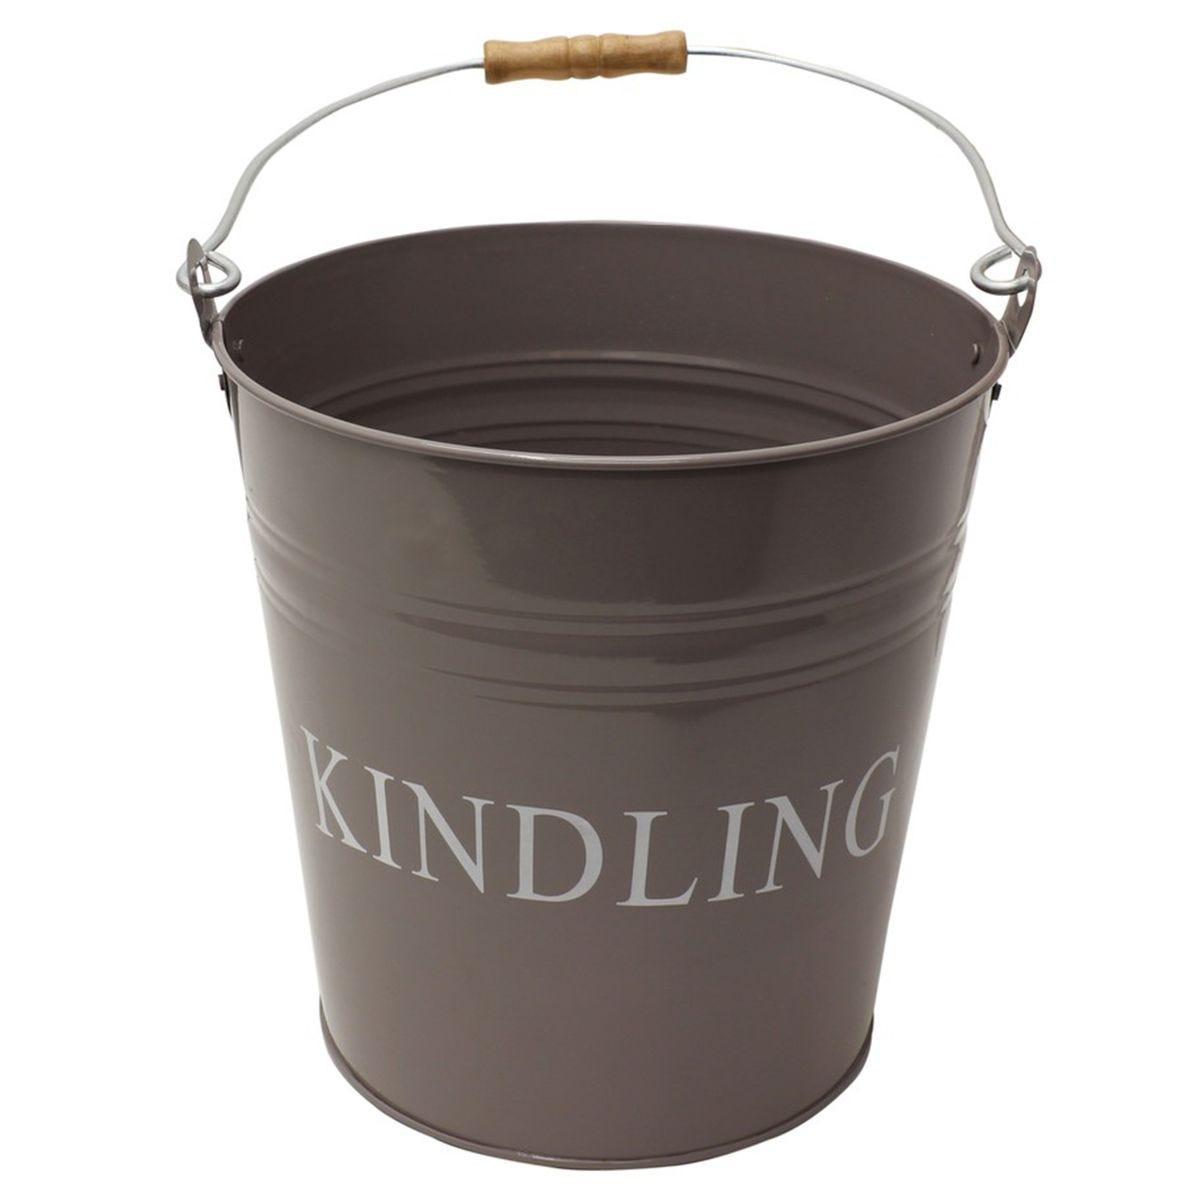 JVL Charlton Fireside Metal Kindling Bucket